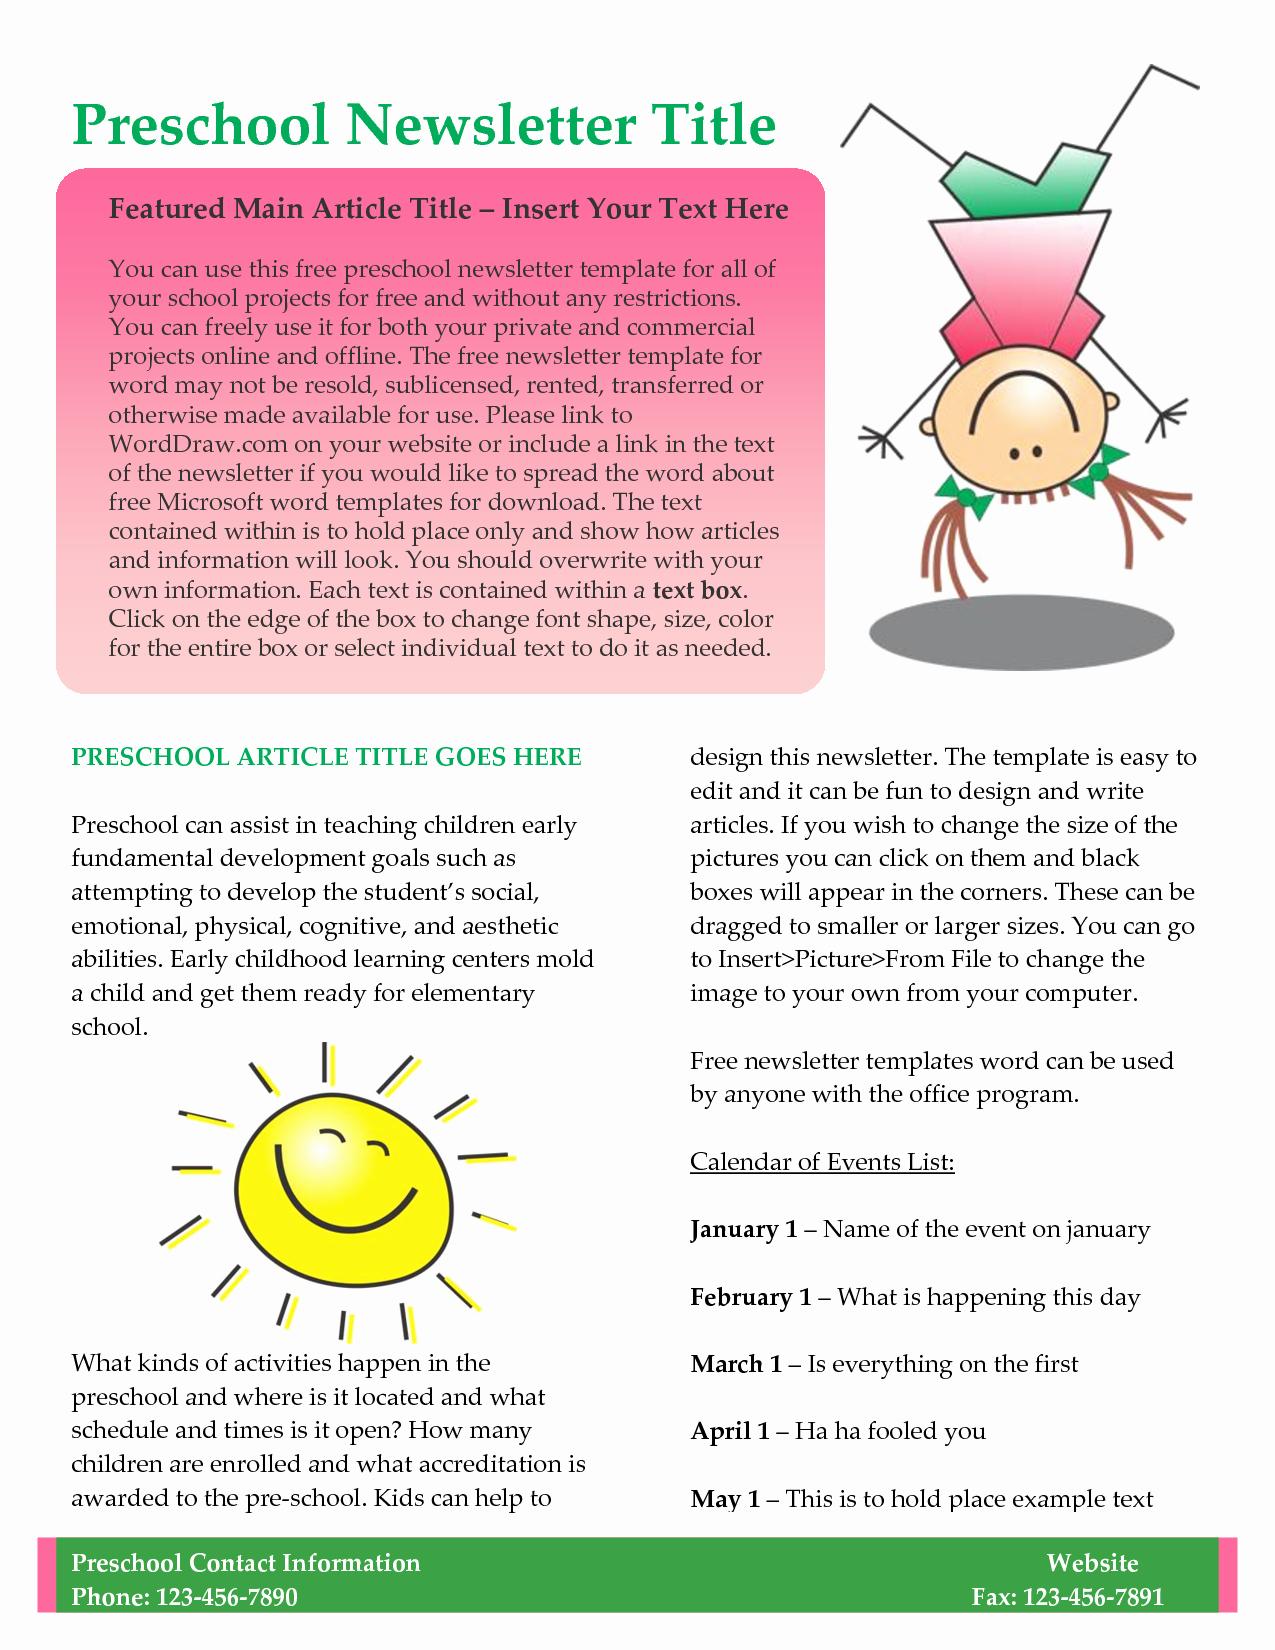 Free Newsletter Templates for Preschool Best Of Preschool Newsletter Template